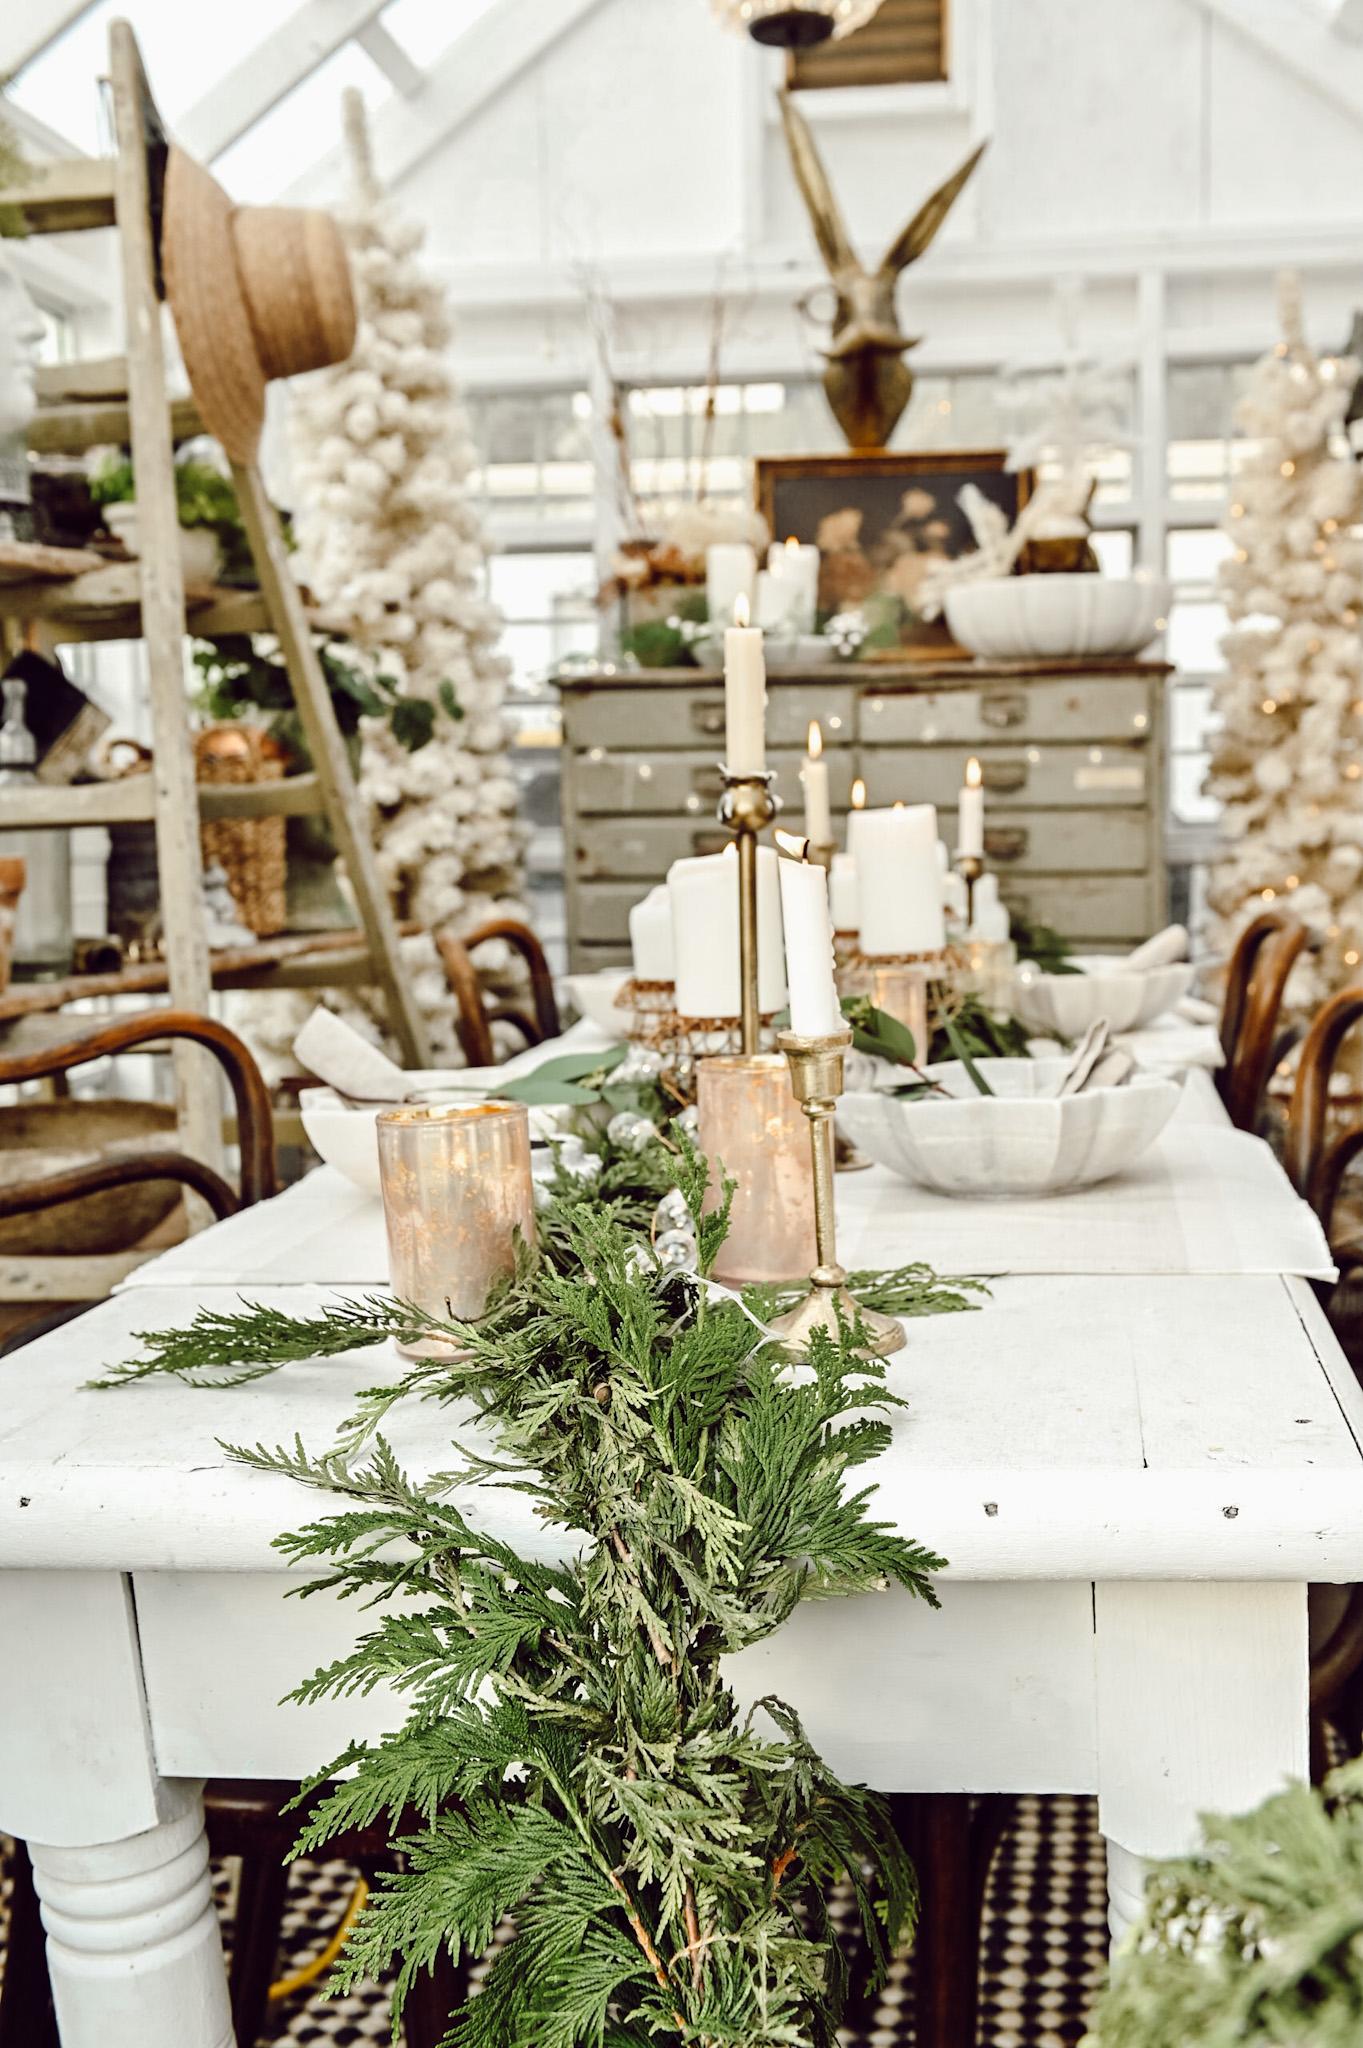 Greenhouse Christmas Centerpiece